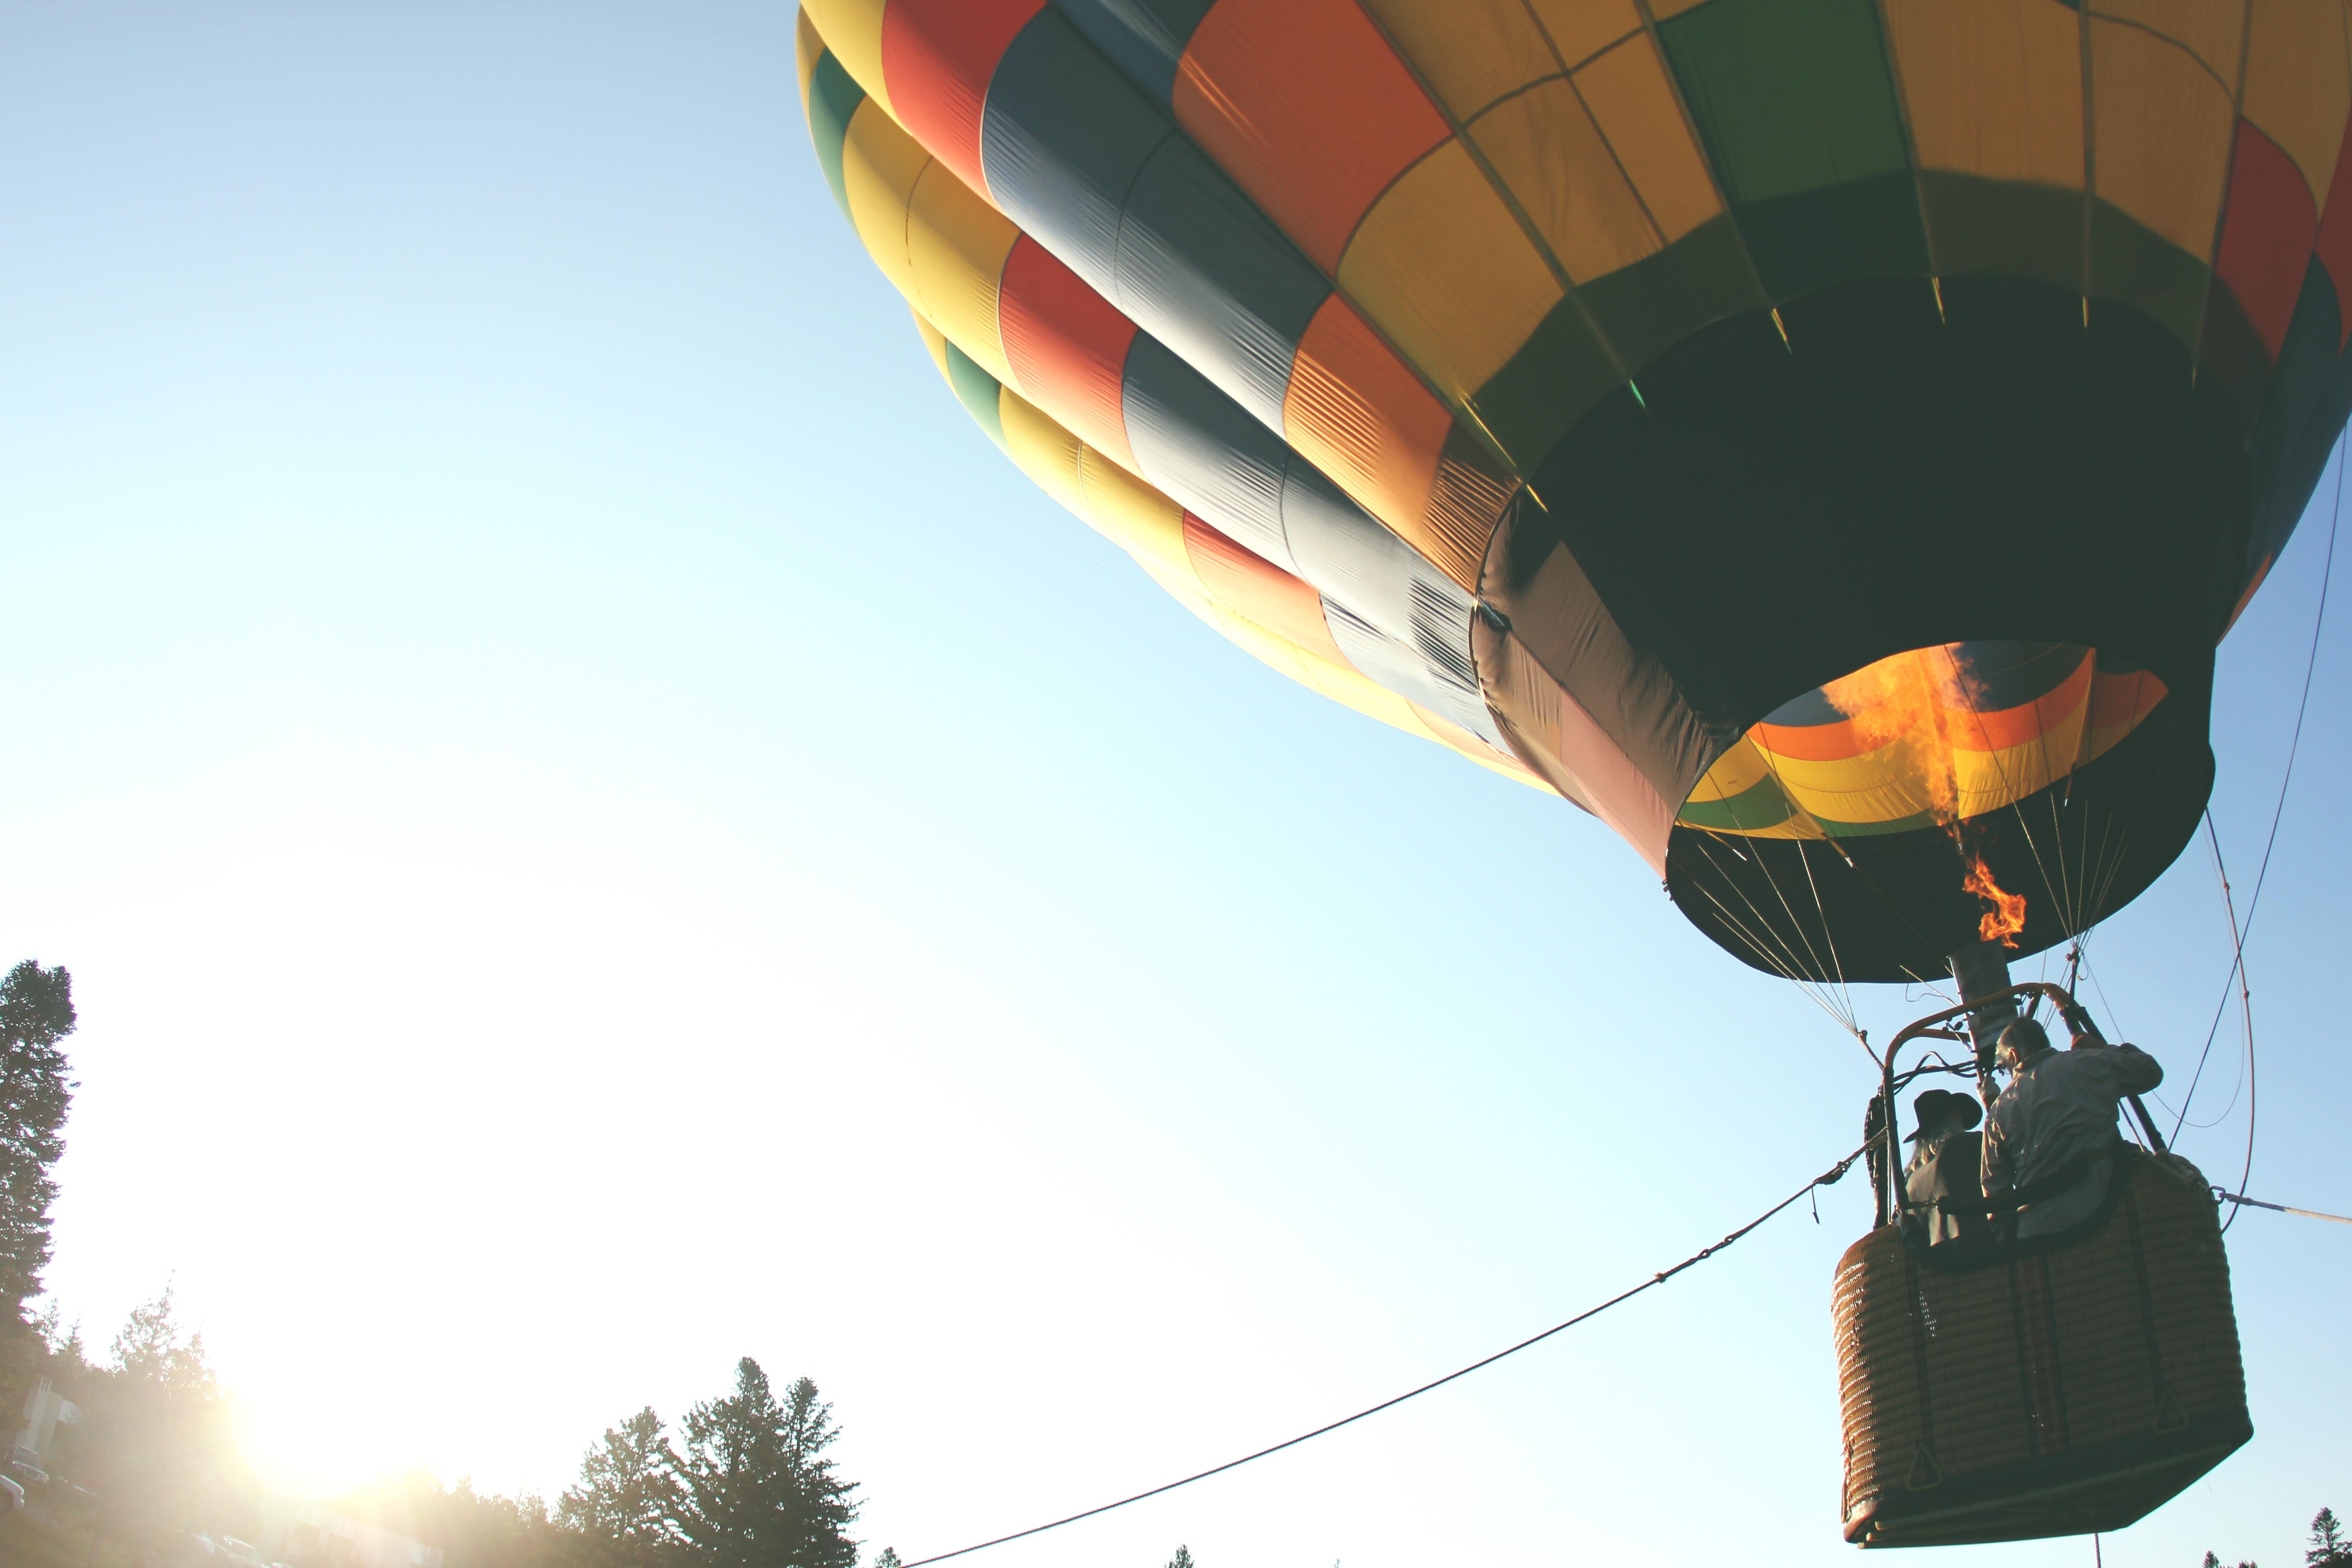 person riding on hot air balloon